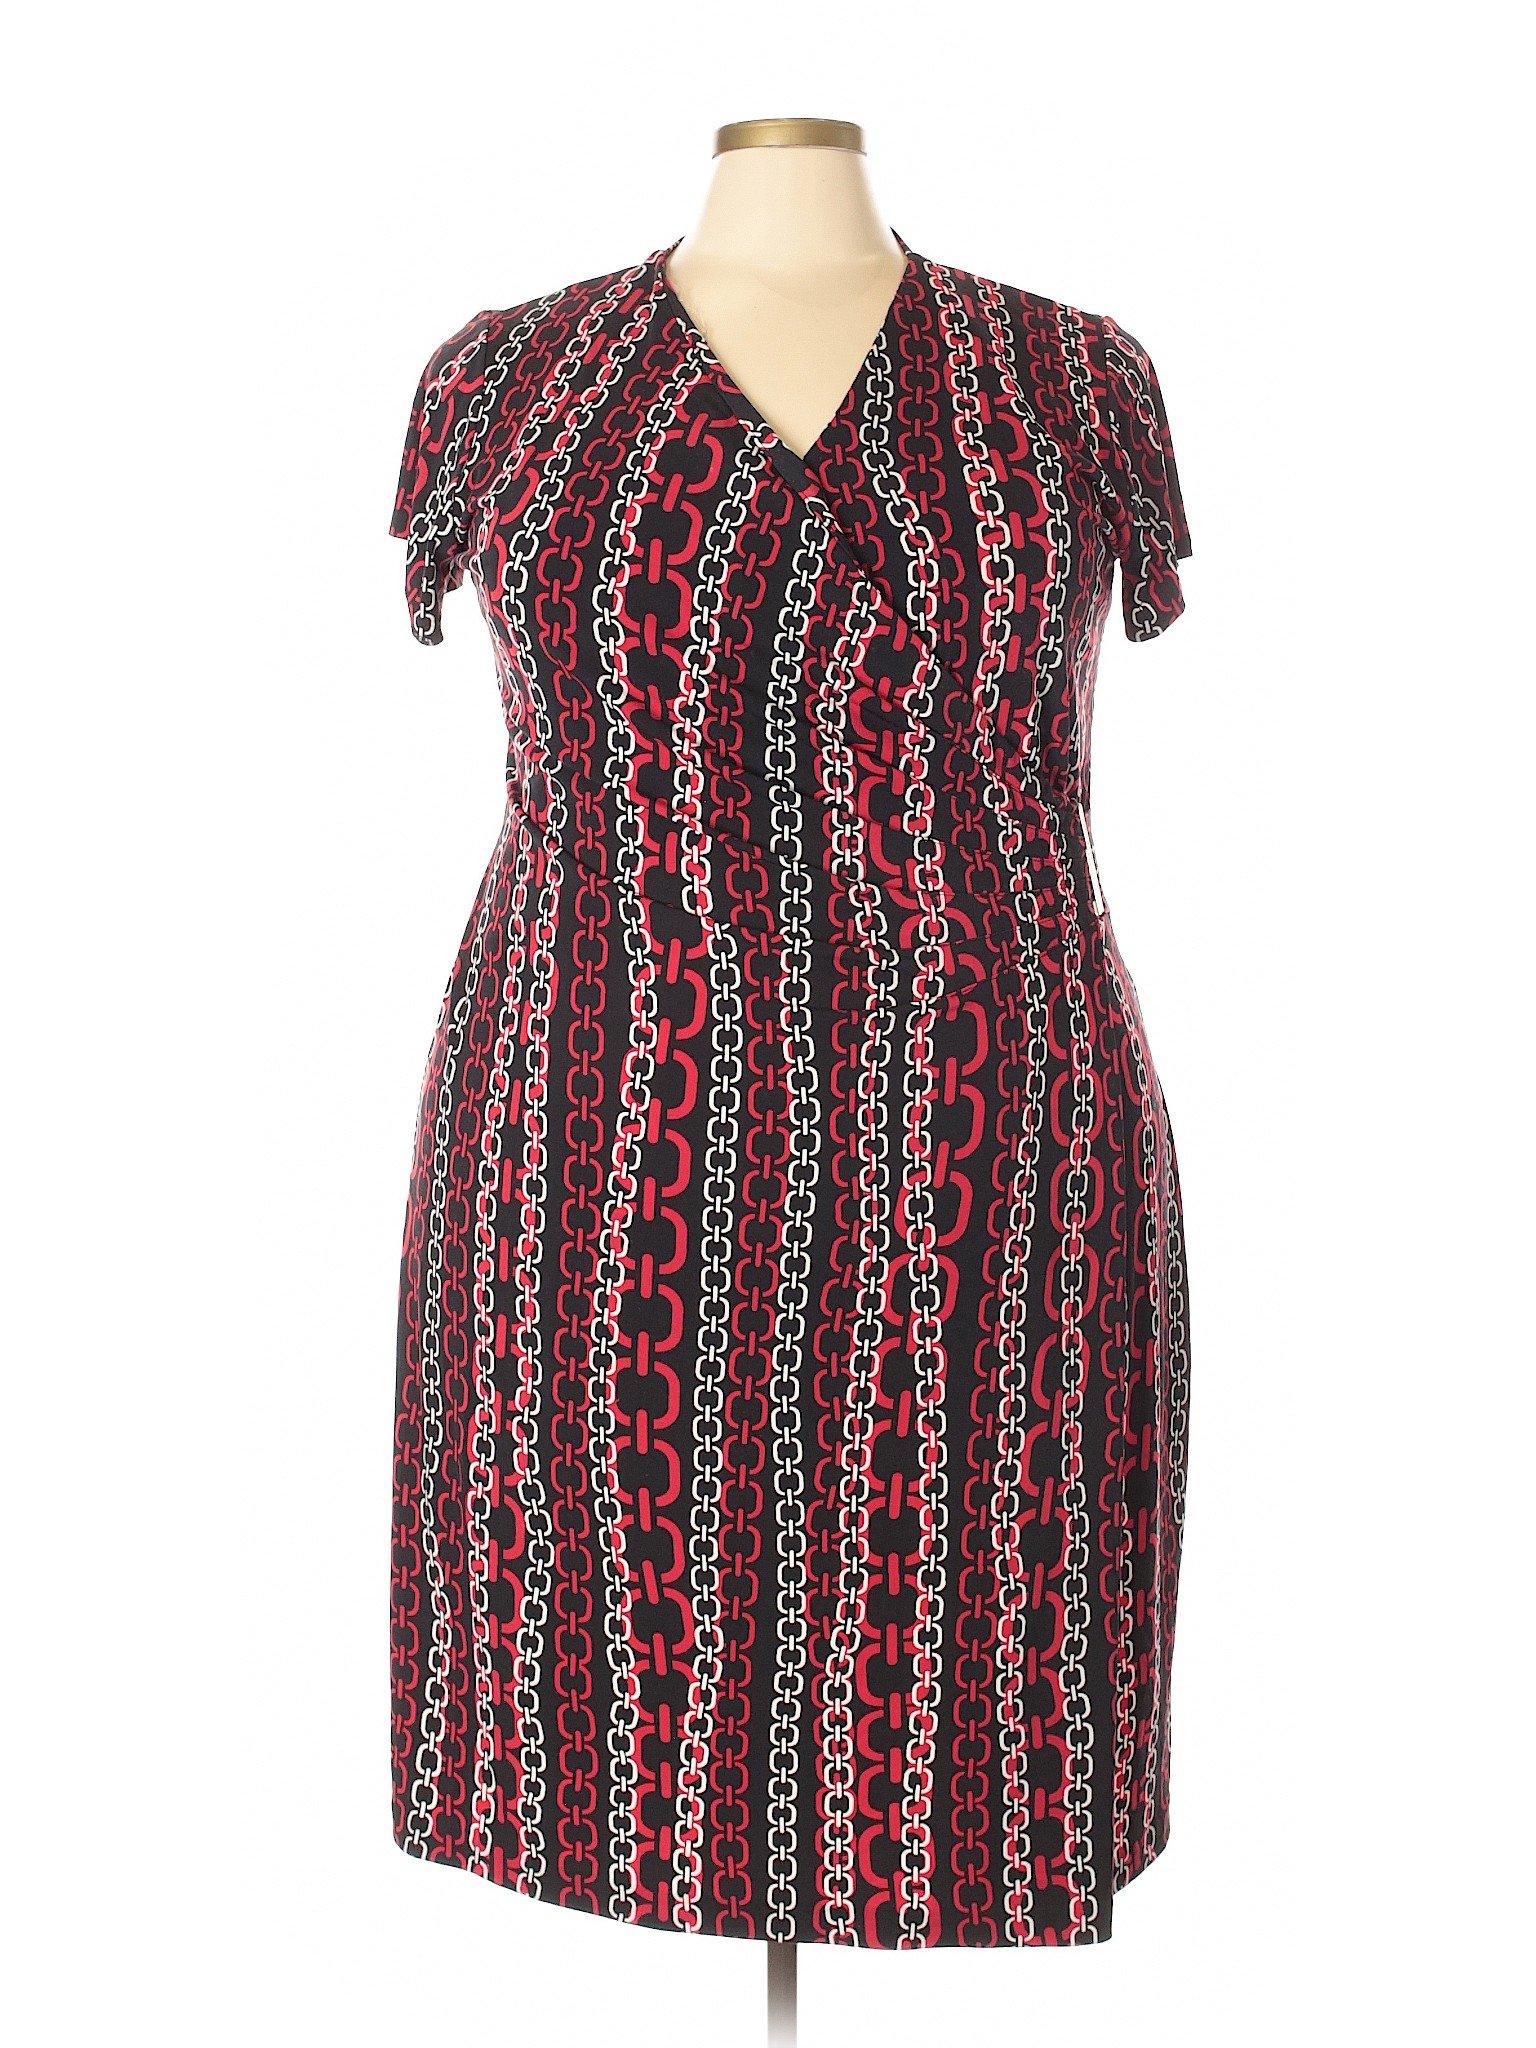 Dress York Jones Casual New Selling OEIfqxw